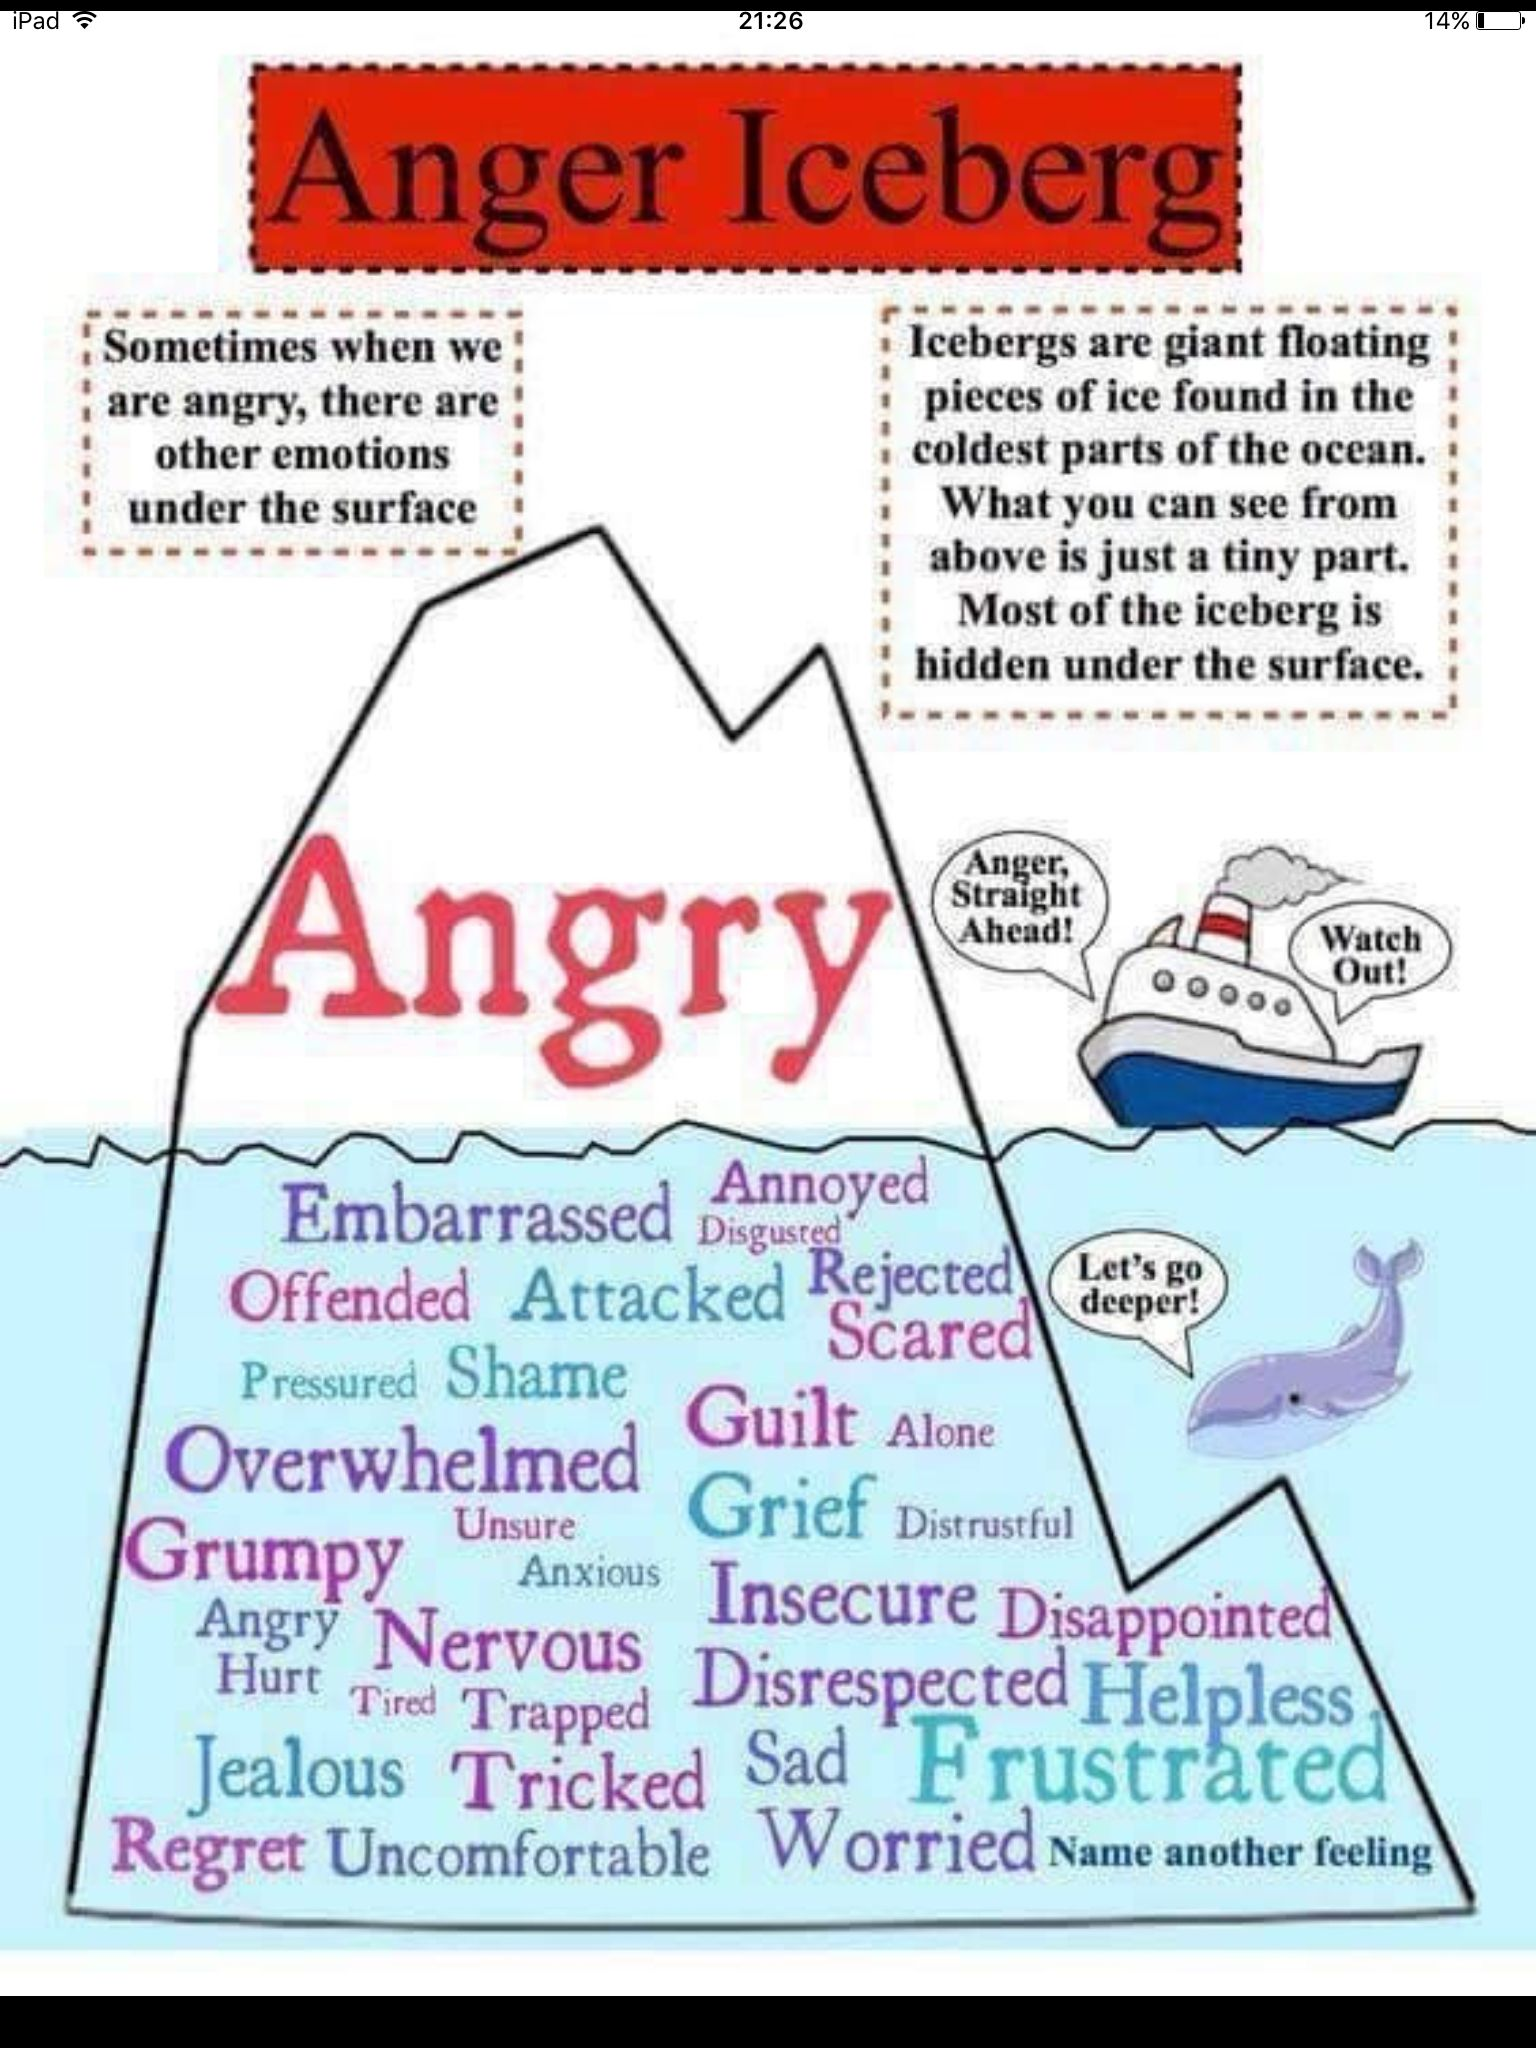 Anger iceberg | Social emotional learning, Counseling ...